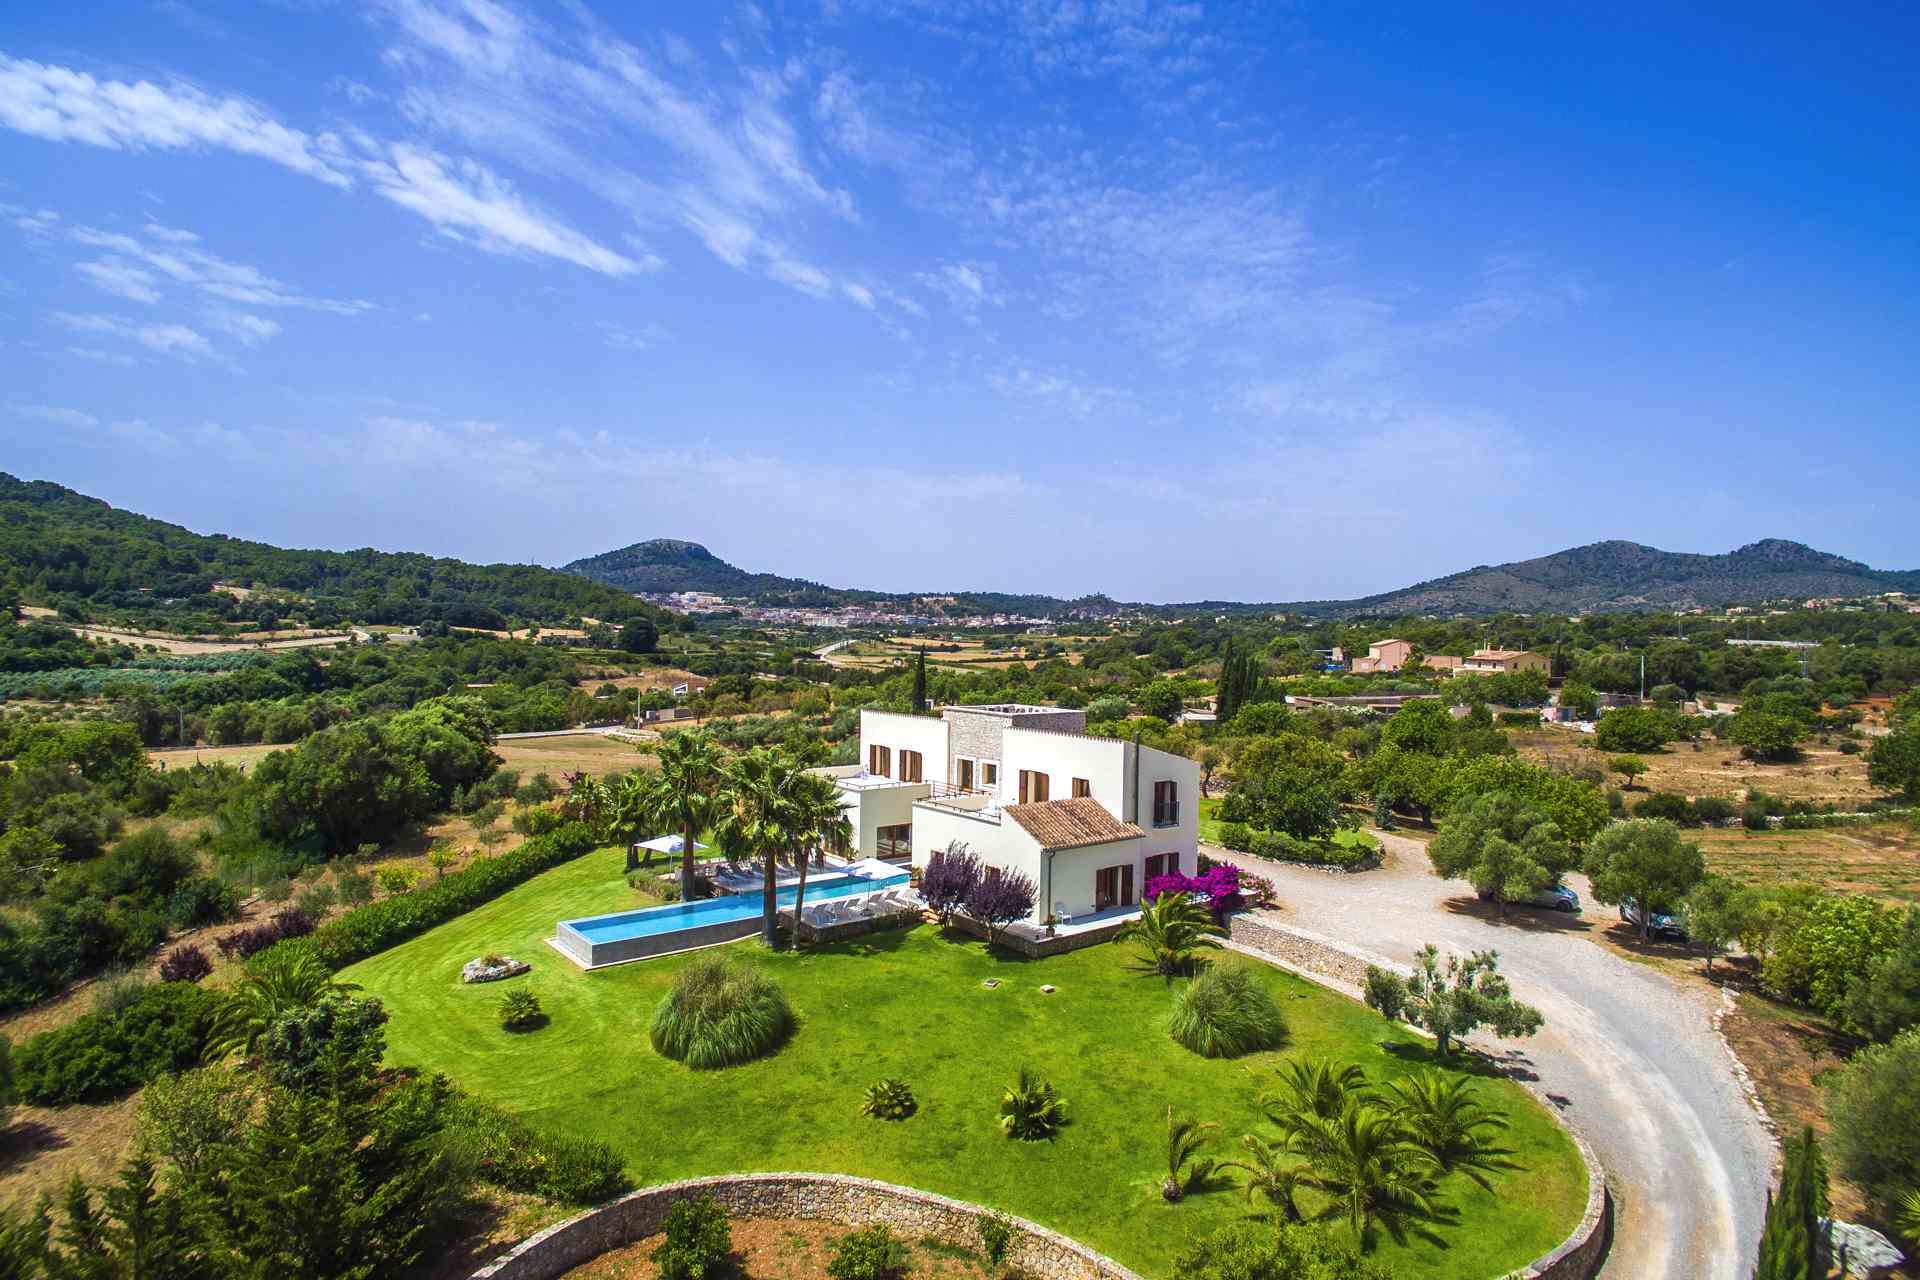 01-28 Luxus Finca Mallorca Nordosten Bild 5